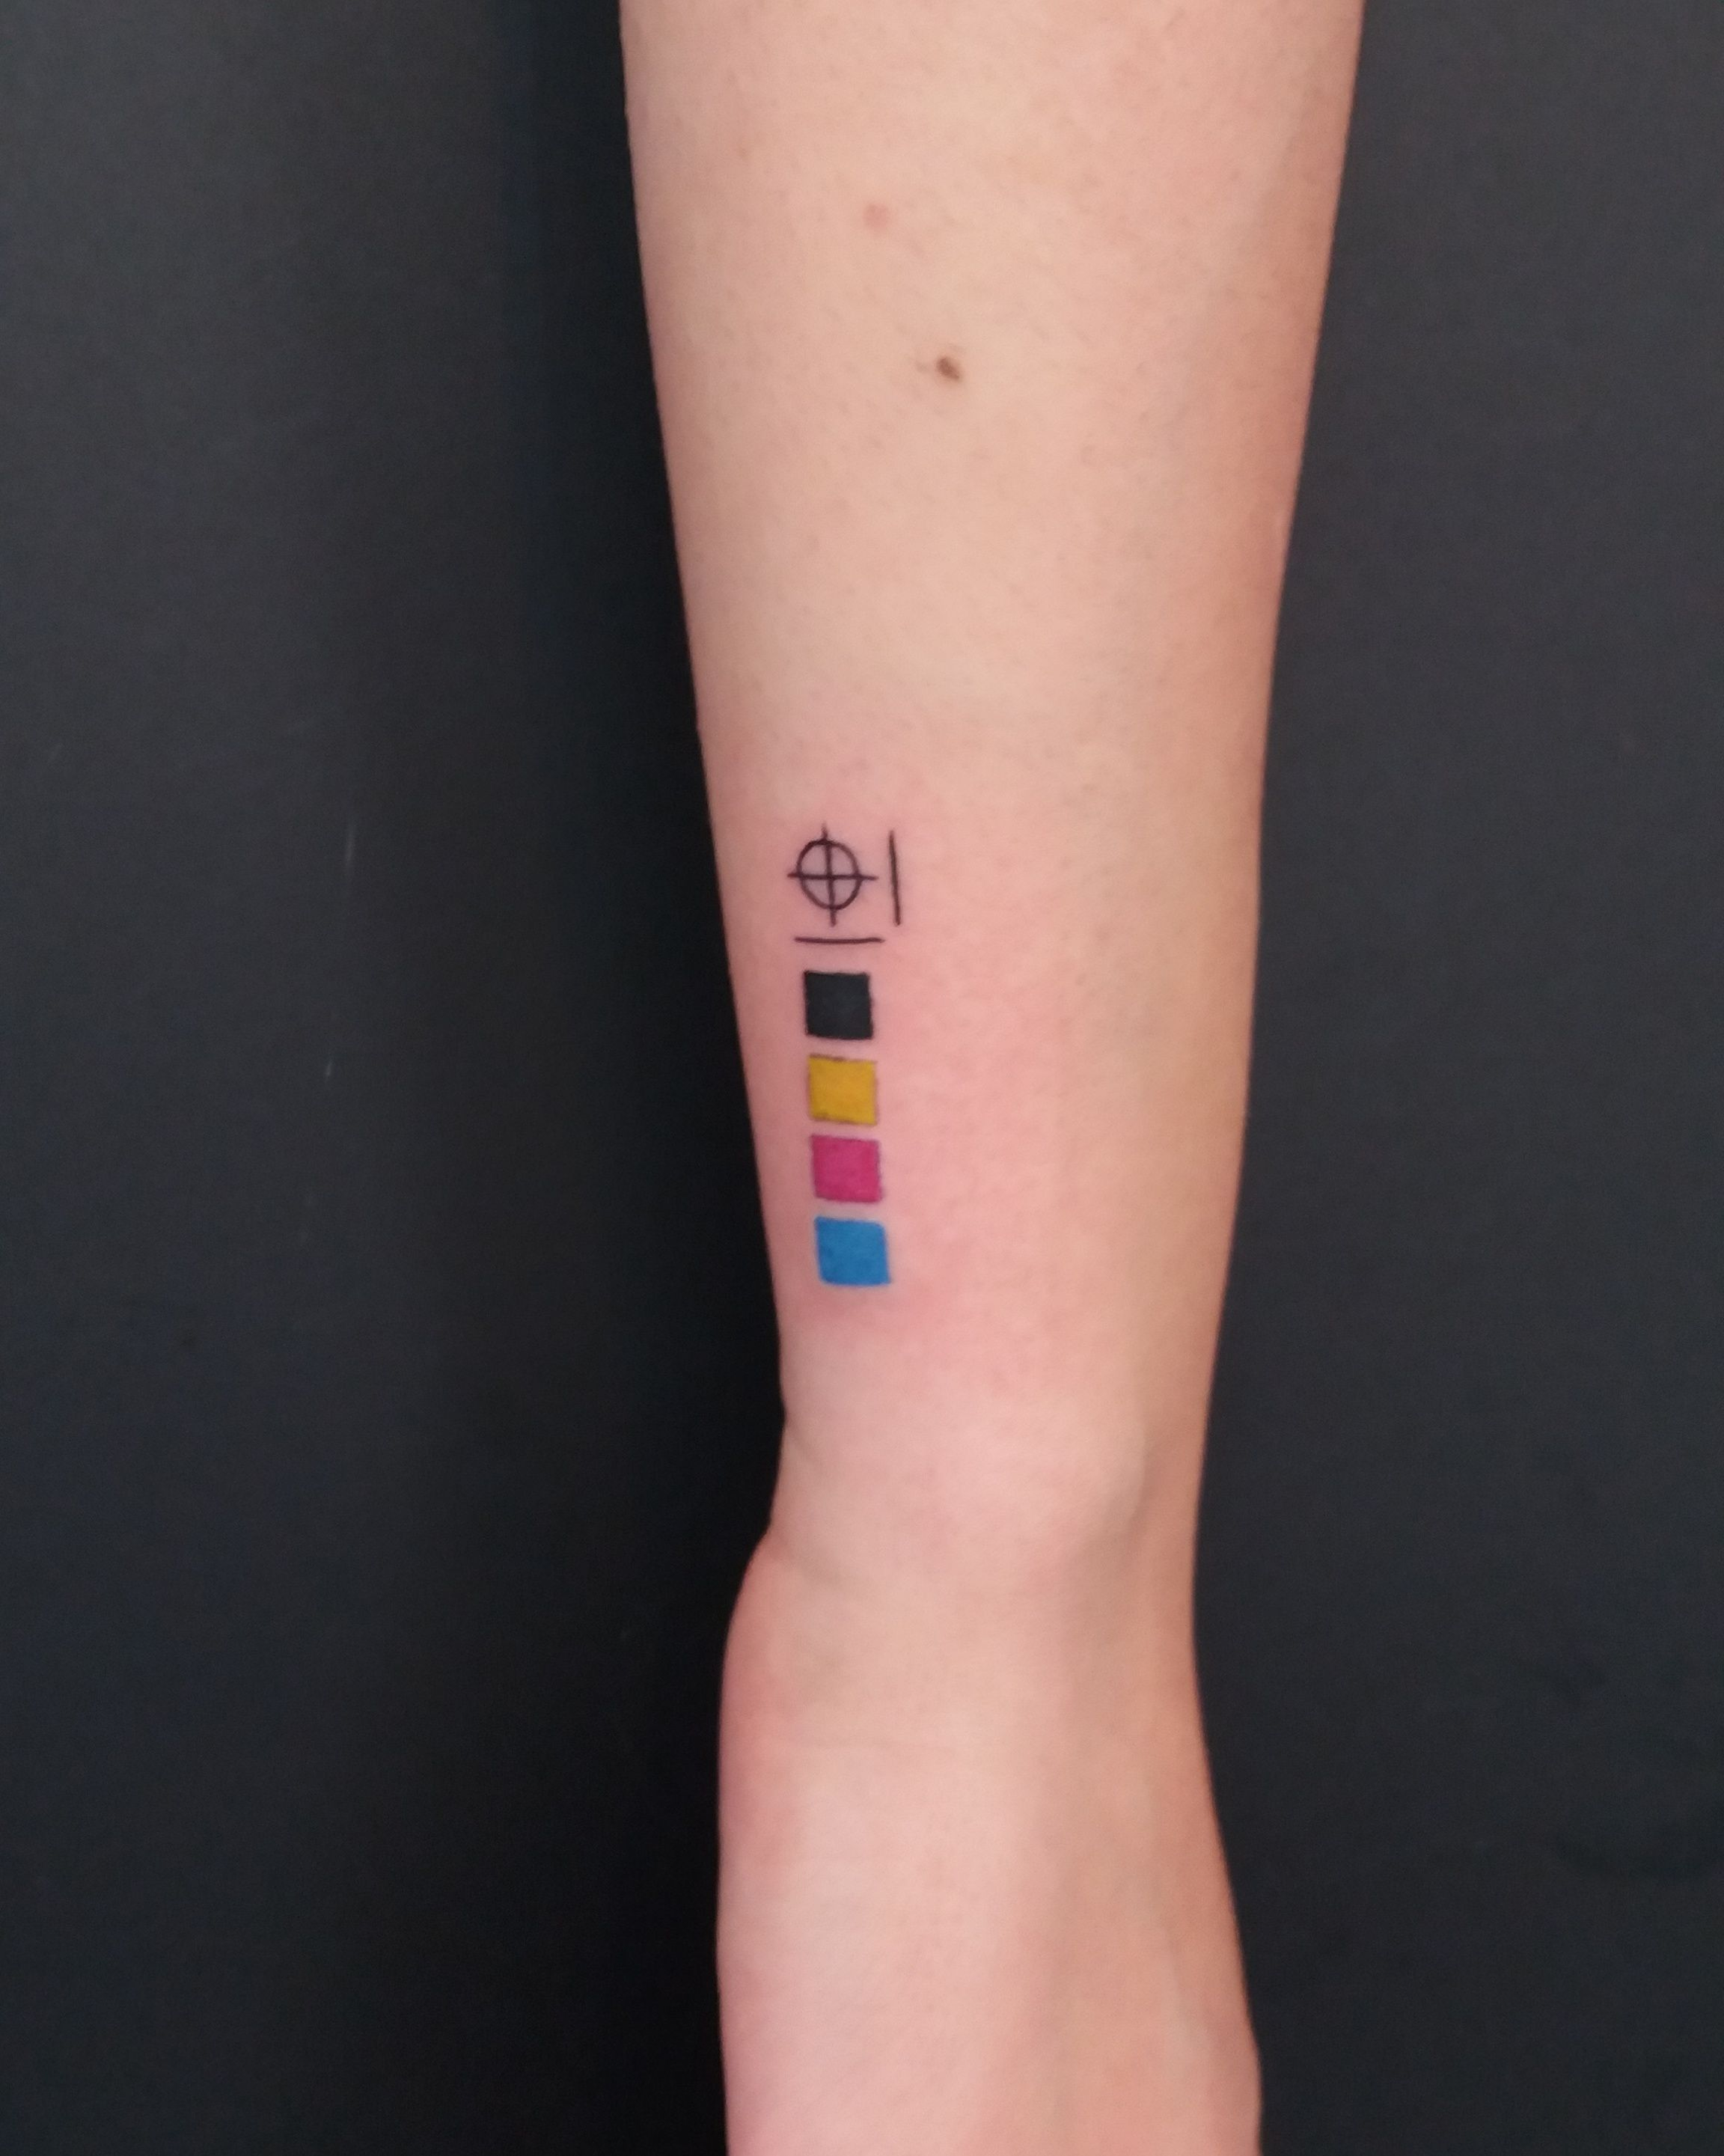 Cmyk Tattoo Color Small Tattoos Trendy Tattoos Graphic Design Tattoos